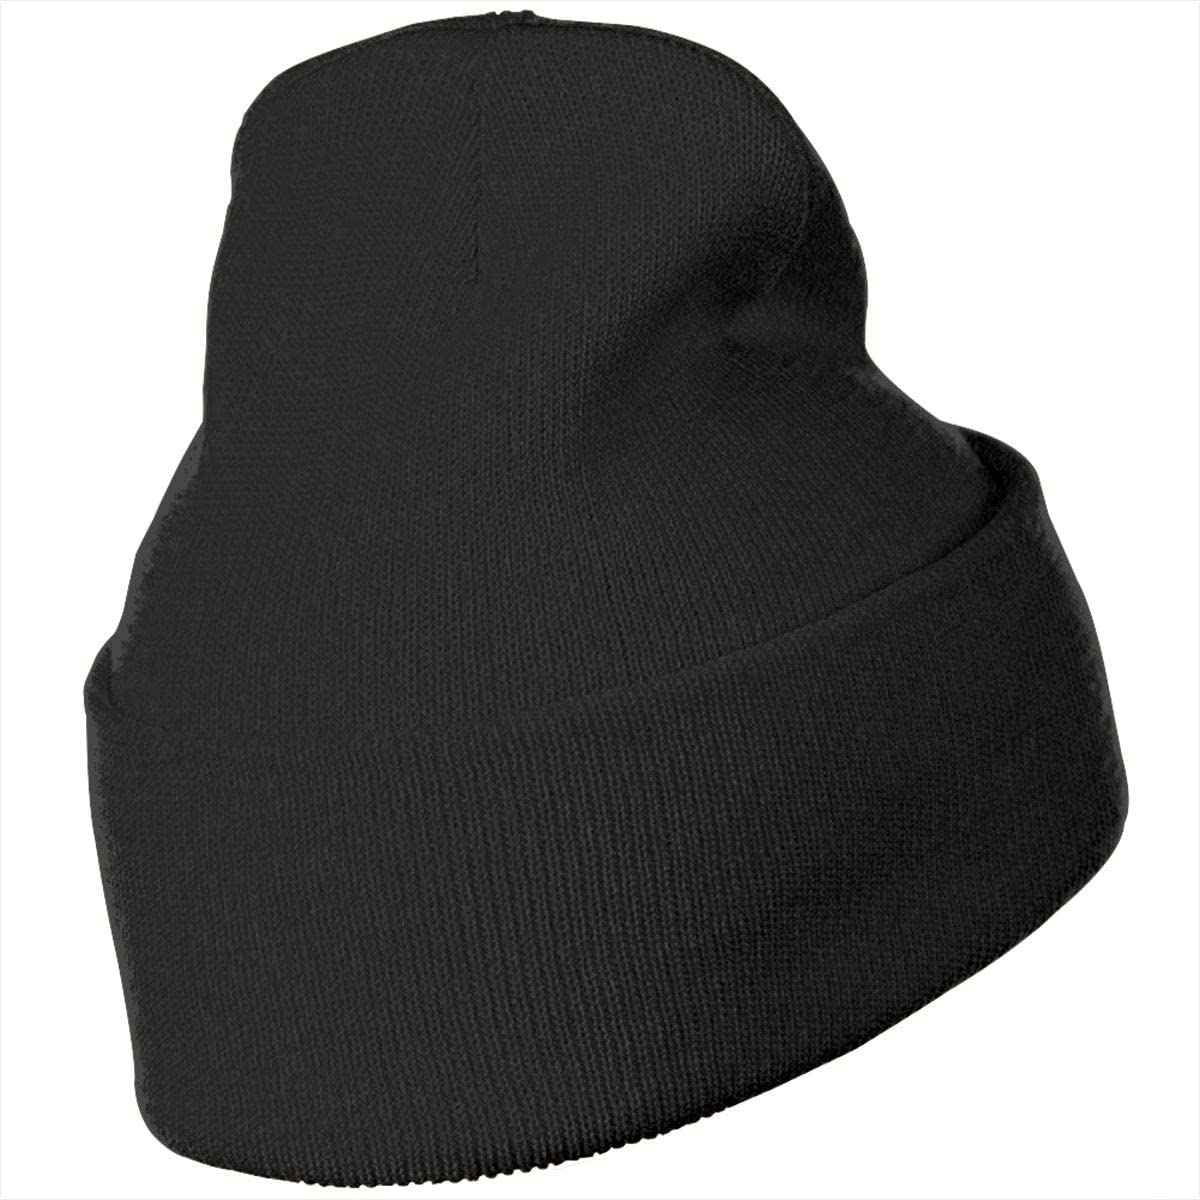 QZqDQ Funny Cow Unisex Fashion Knitted Hat Luxury Hip-Hop Cap